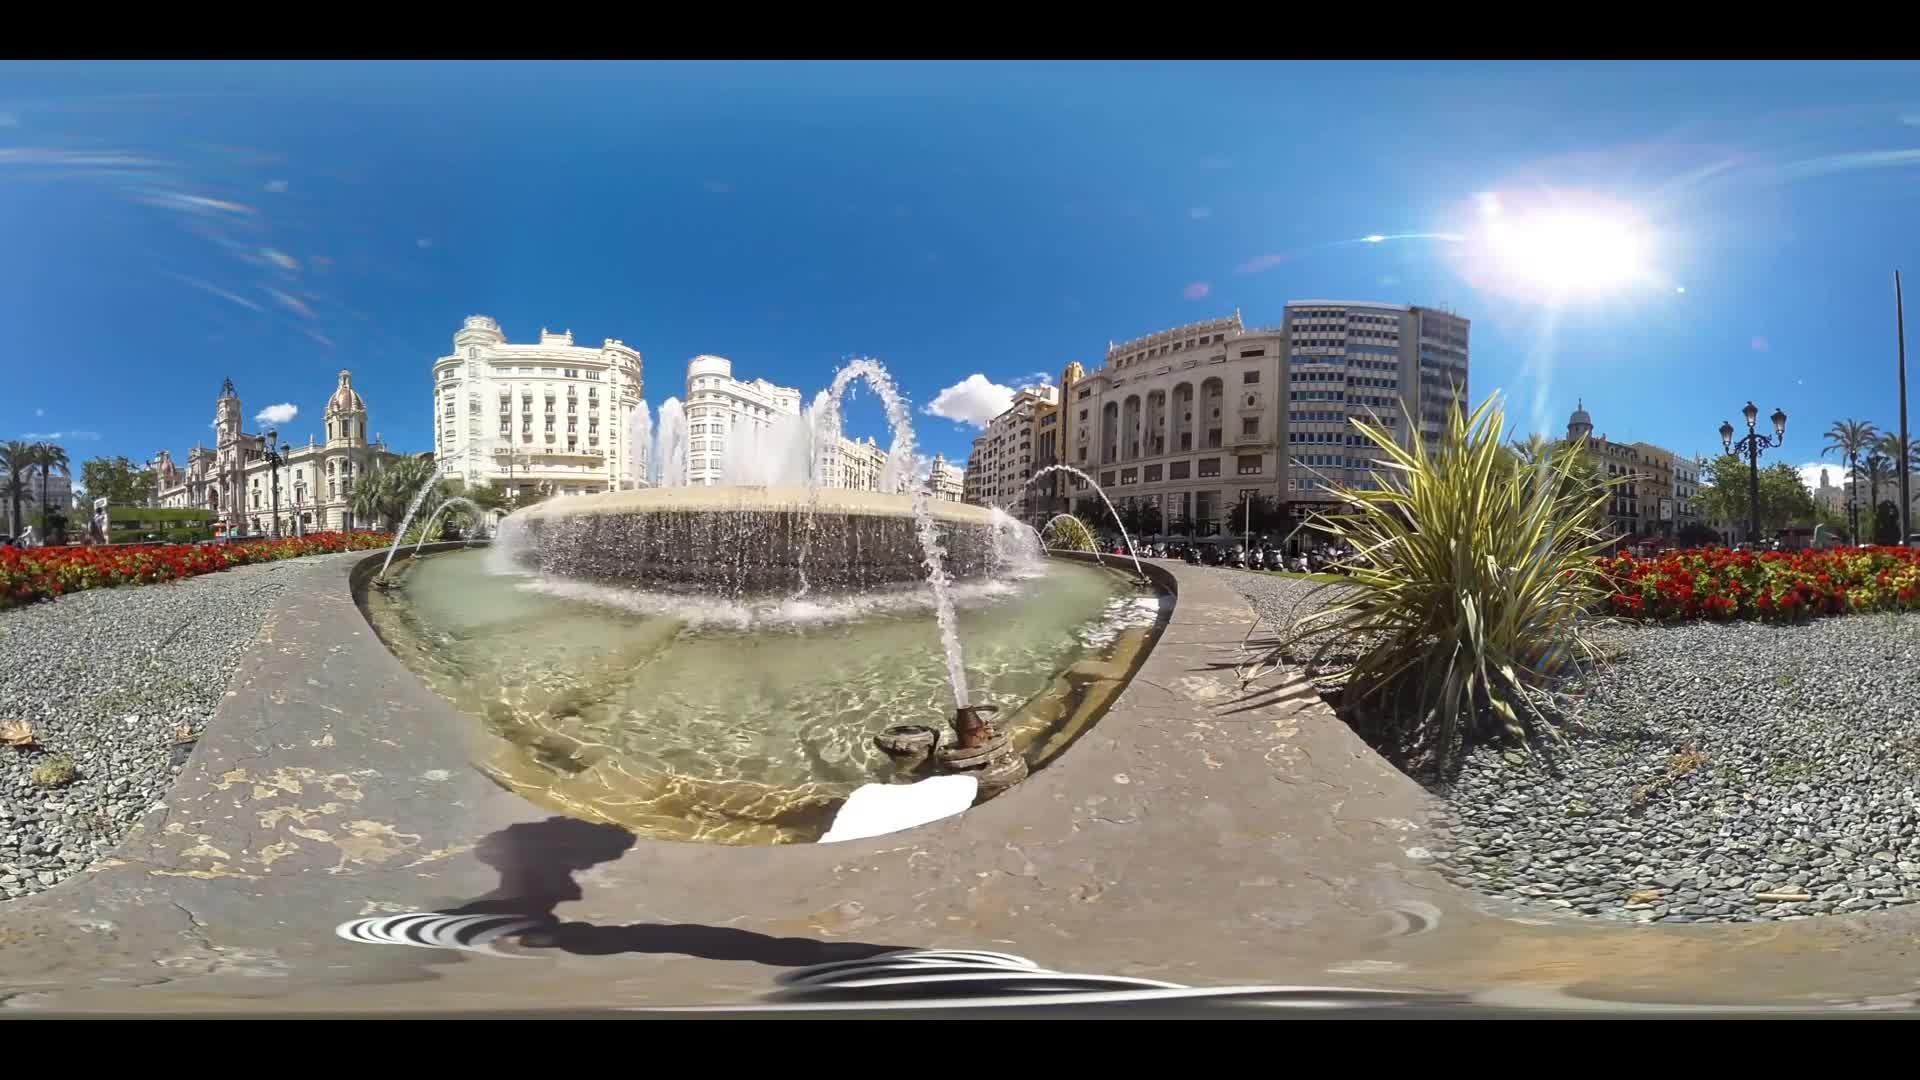 Virtual Reality 360 view from a fountain at Plaça de l'Ajuntament in Valencia in Spain